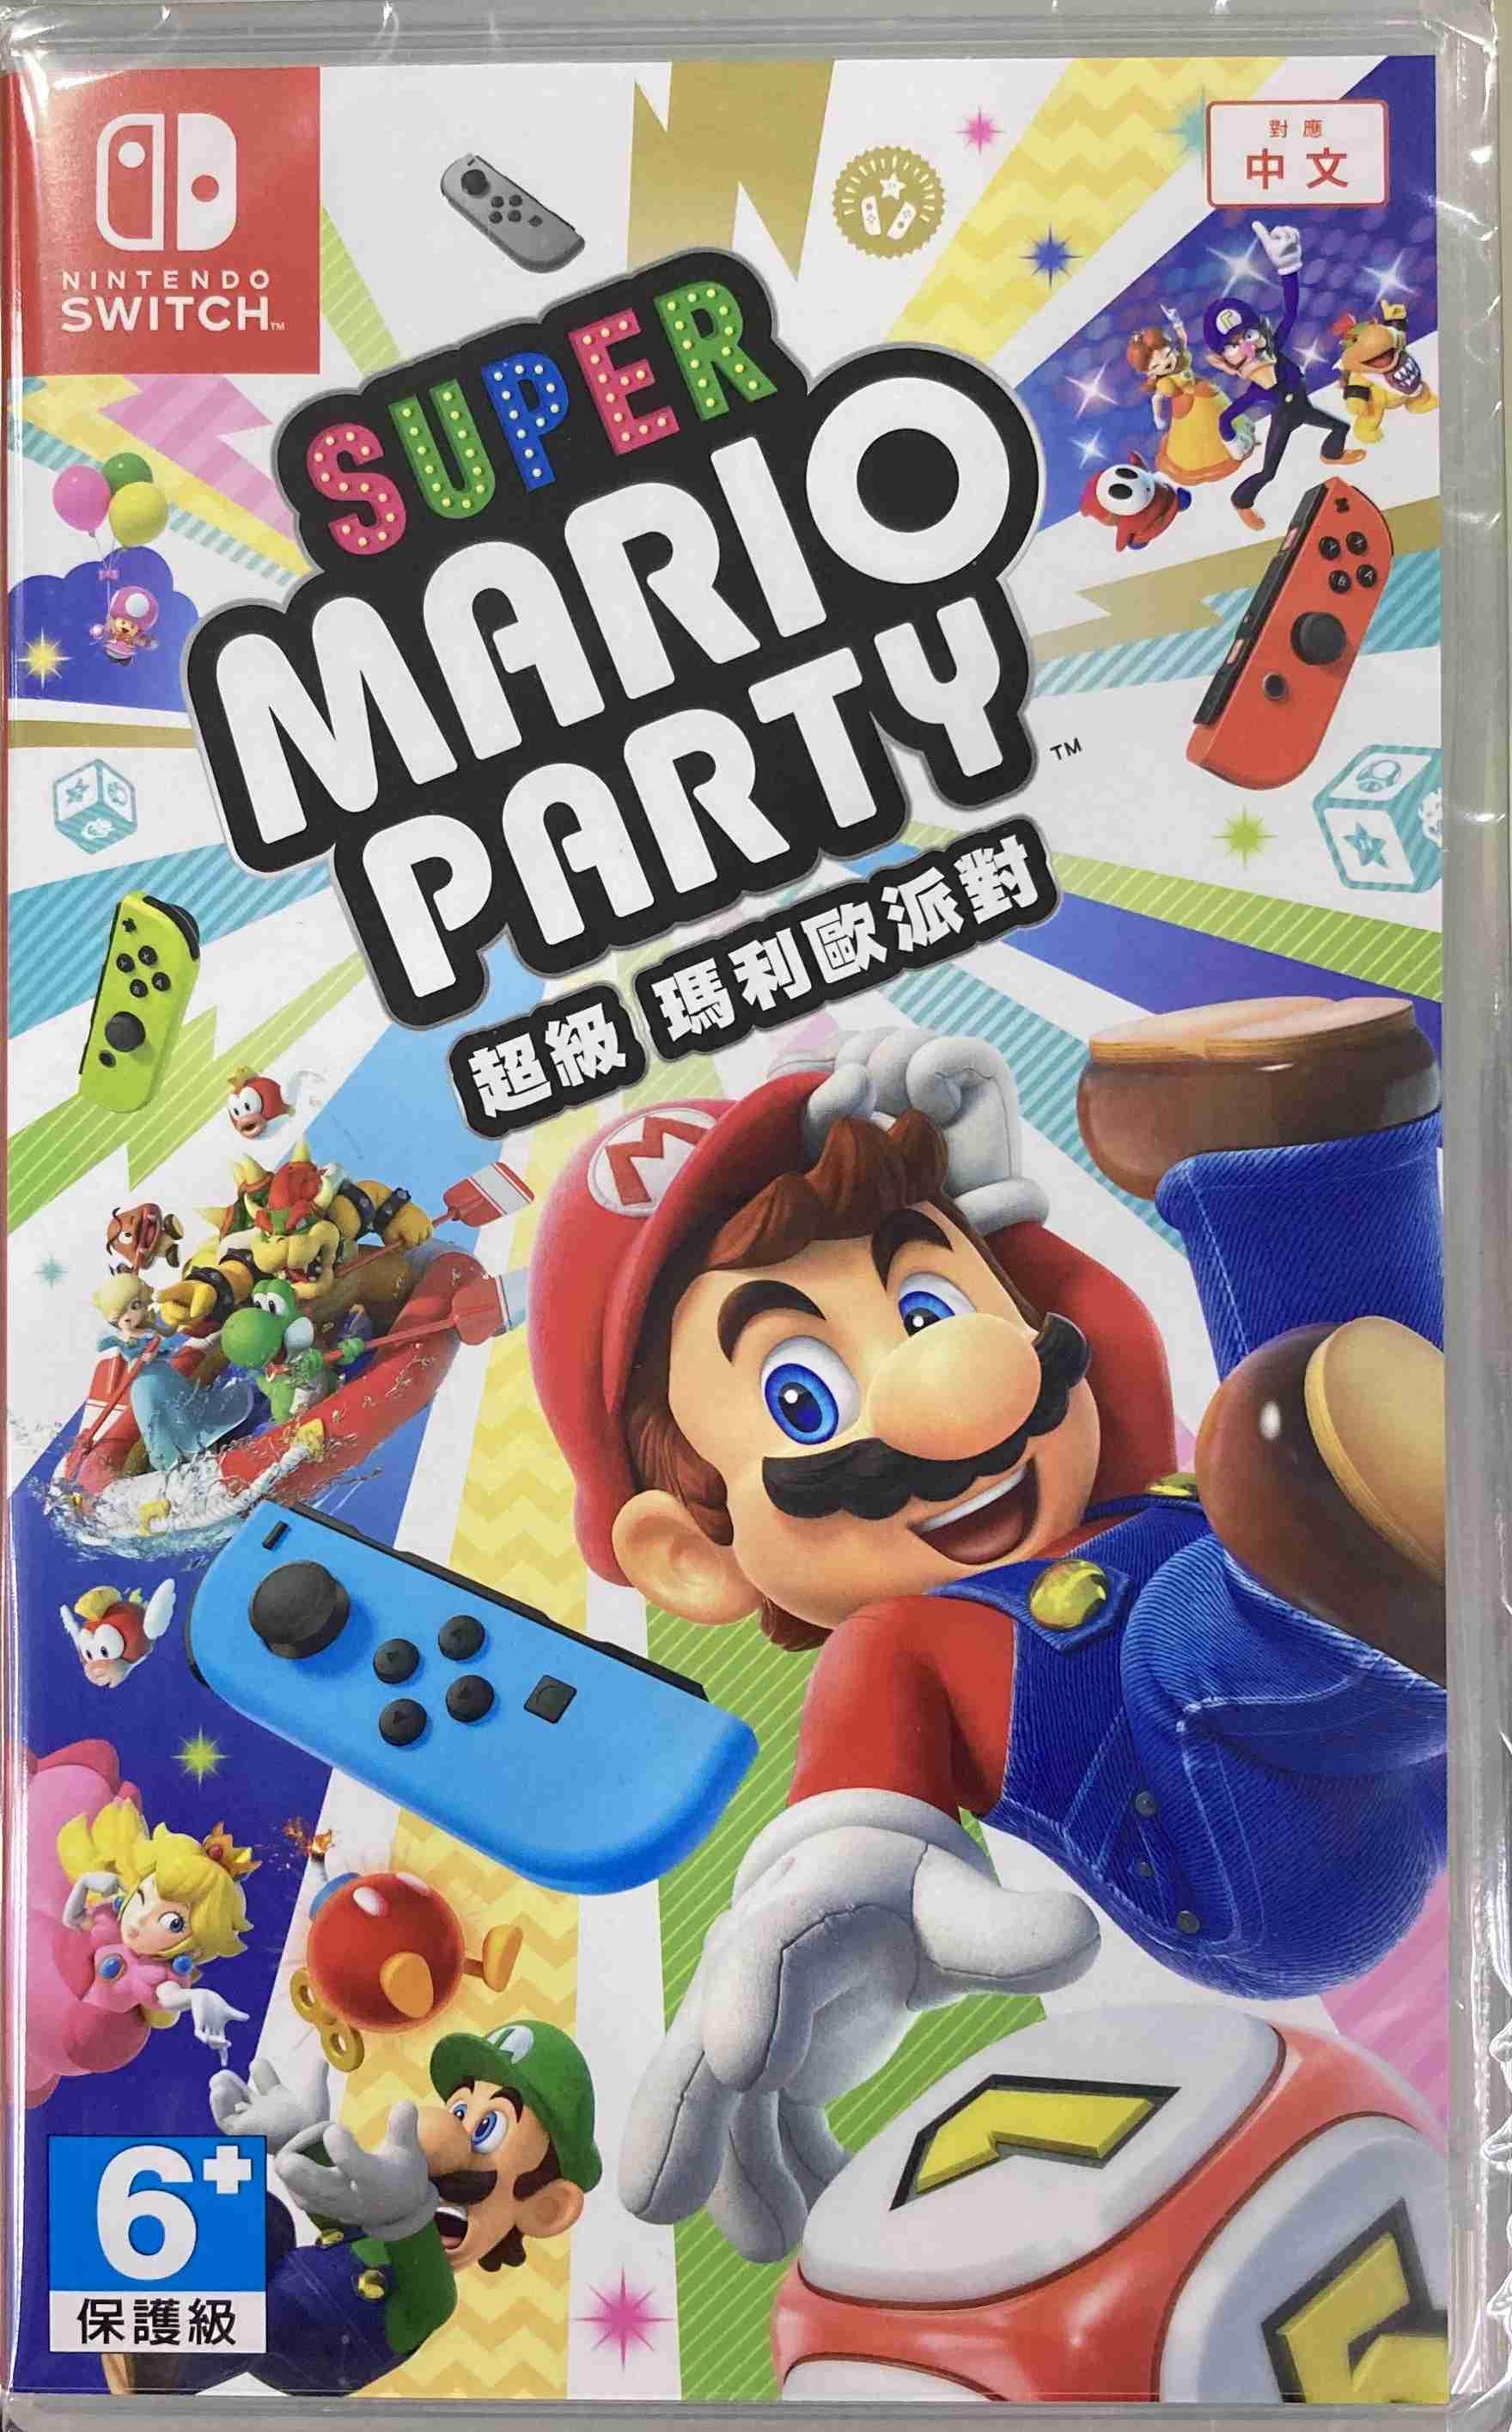 NS Switch 現貨 台灣公司貨 超級瑪利歐派對 Super Mario Party 中文版